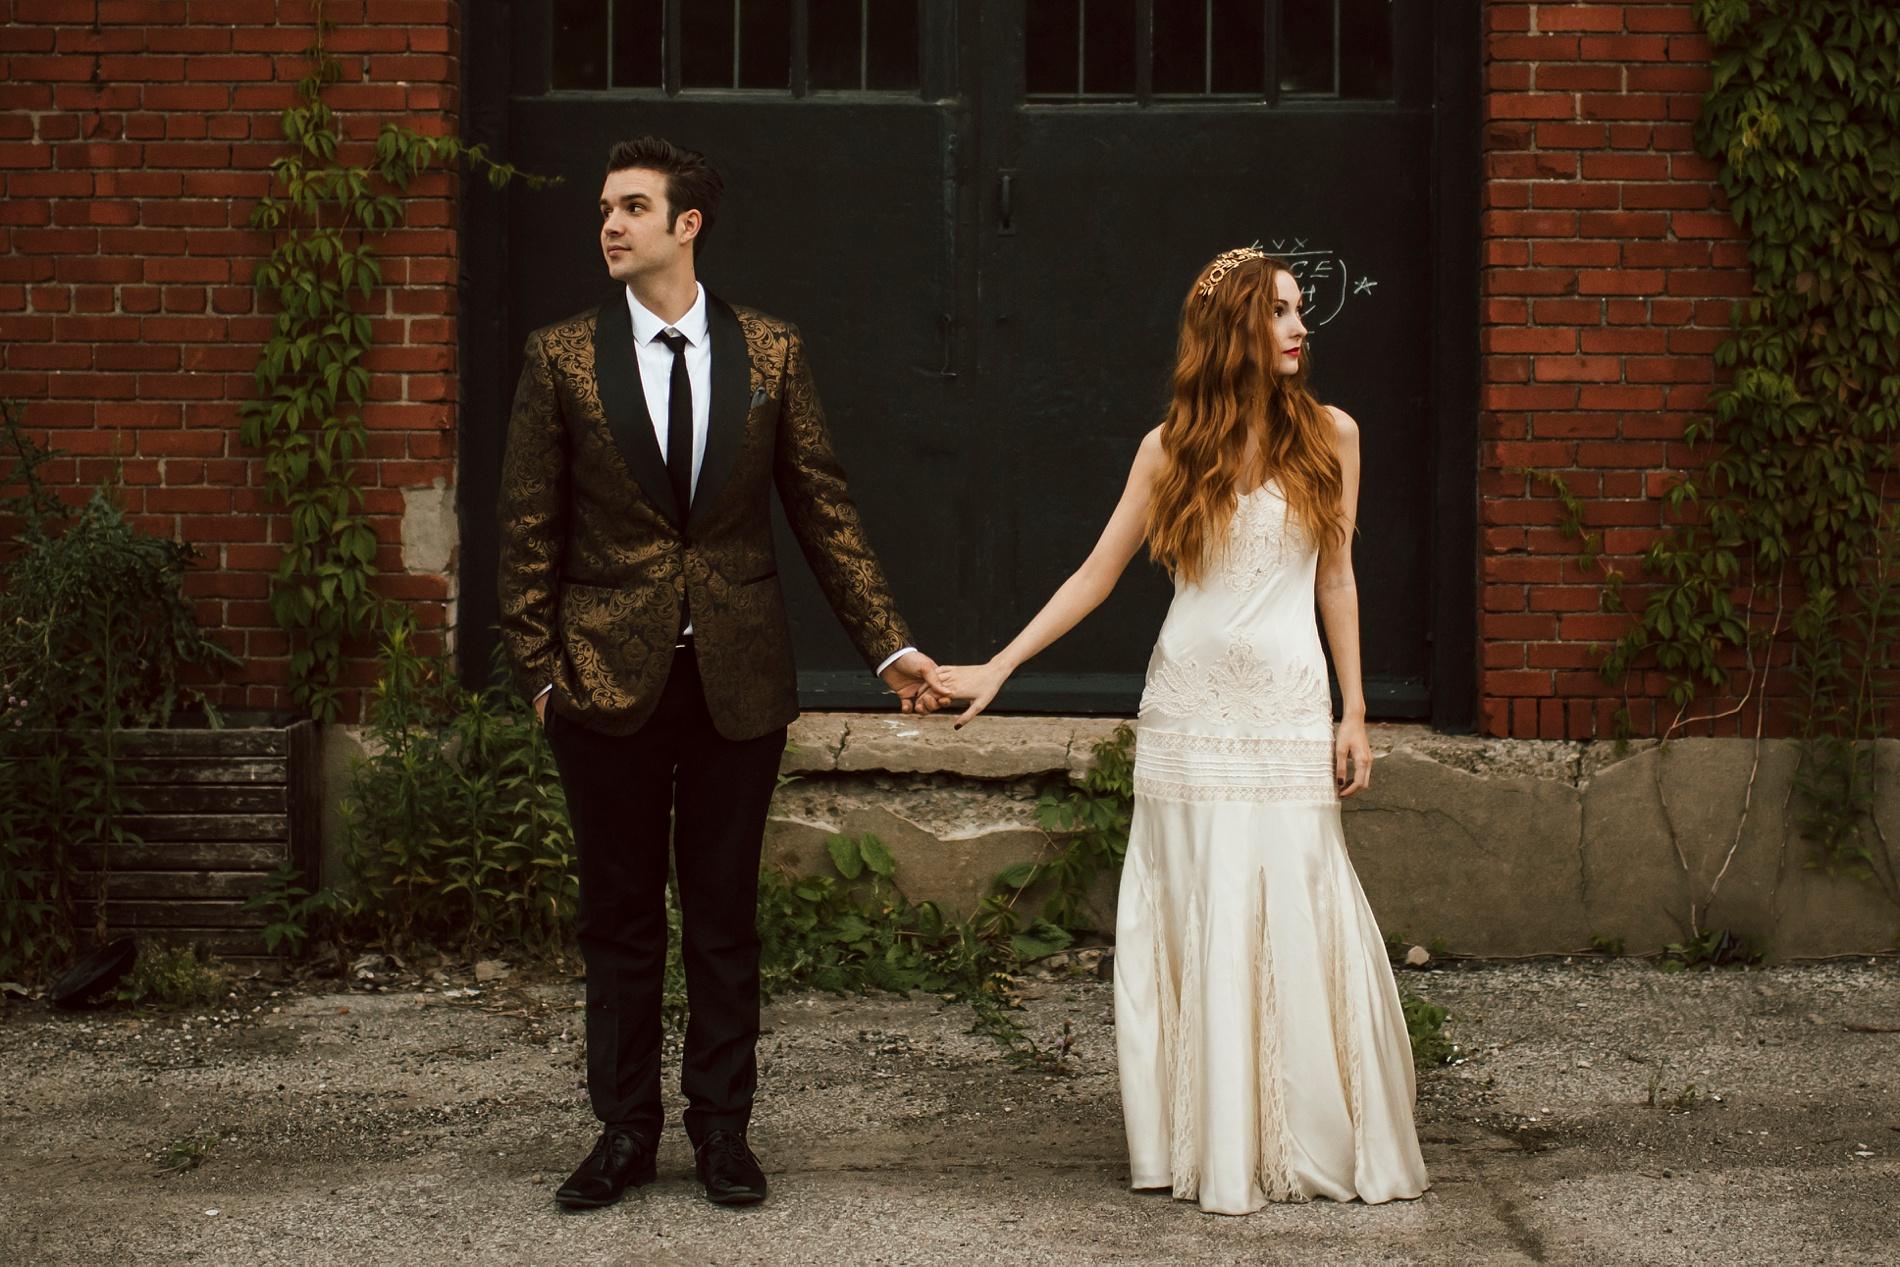 Best_Toronto_Wedding_Photographers_Engagement_shoot_0035.jpg